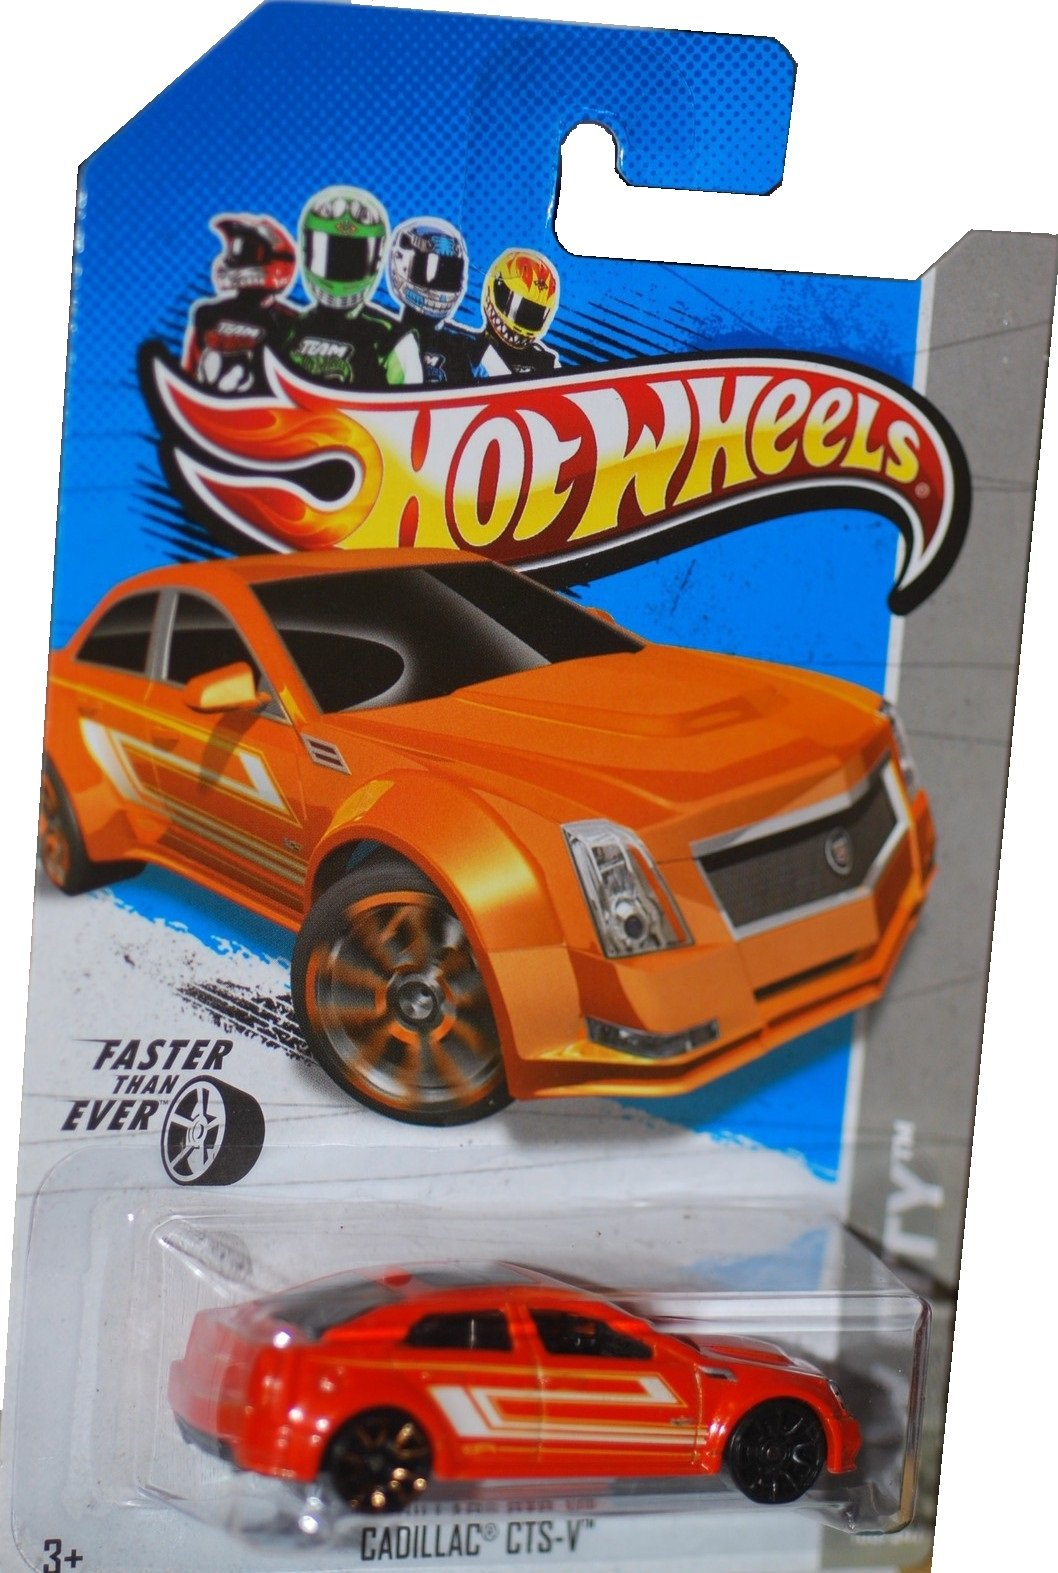 Mattel Hot Wheels - Cadillac CTS-V - HW City - 100/247 [Scale 1:64]